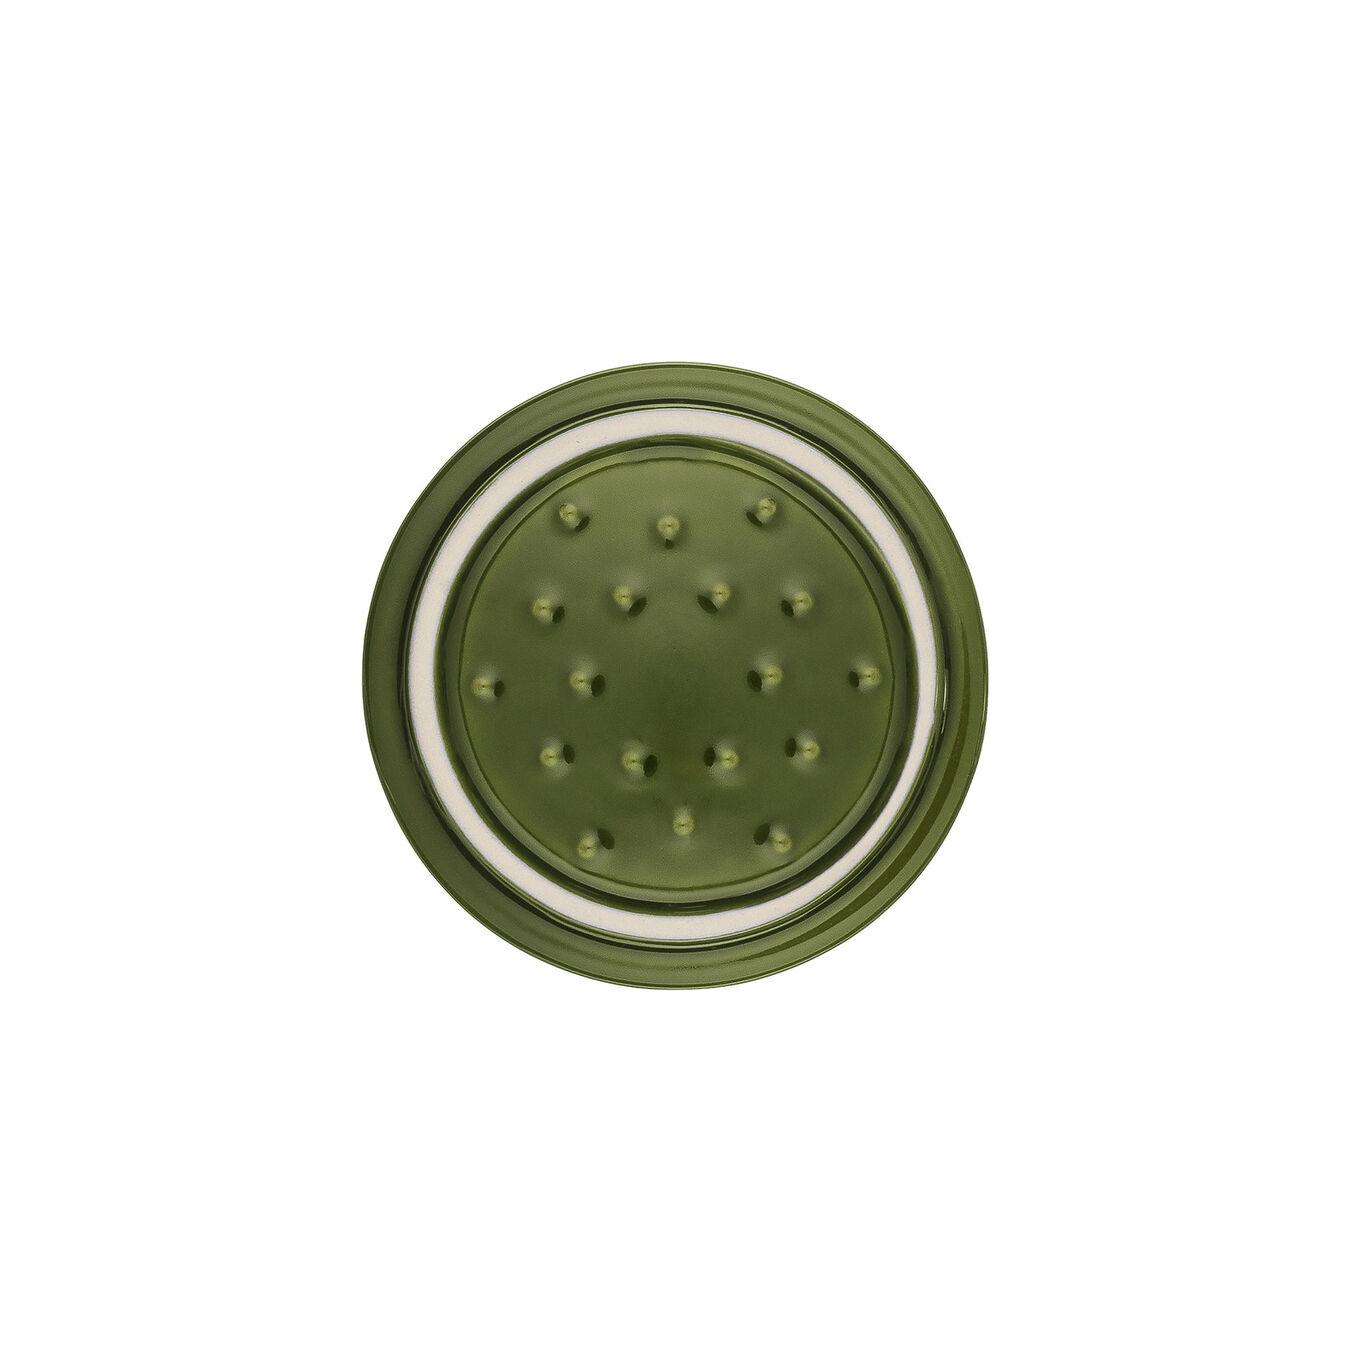 Mini seramik kap, 10 cm | Fesleğen | Yuvarlak | Seramik,,large 2